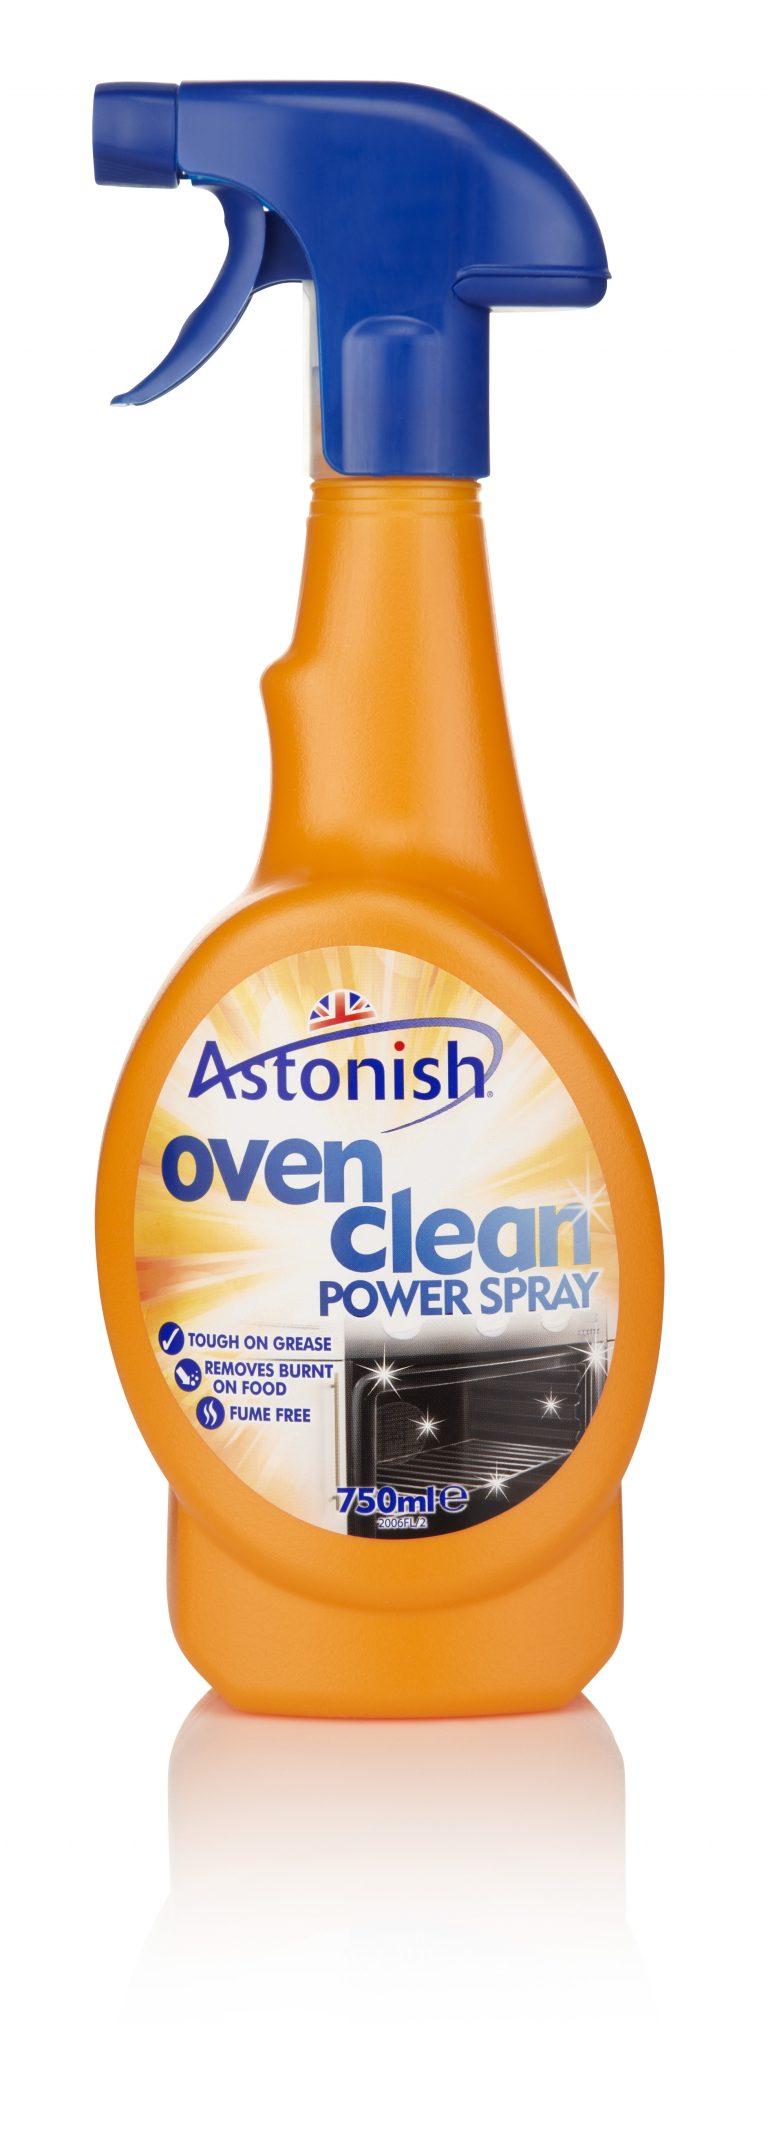 Astonish Oven Cleaner 750ml